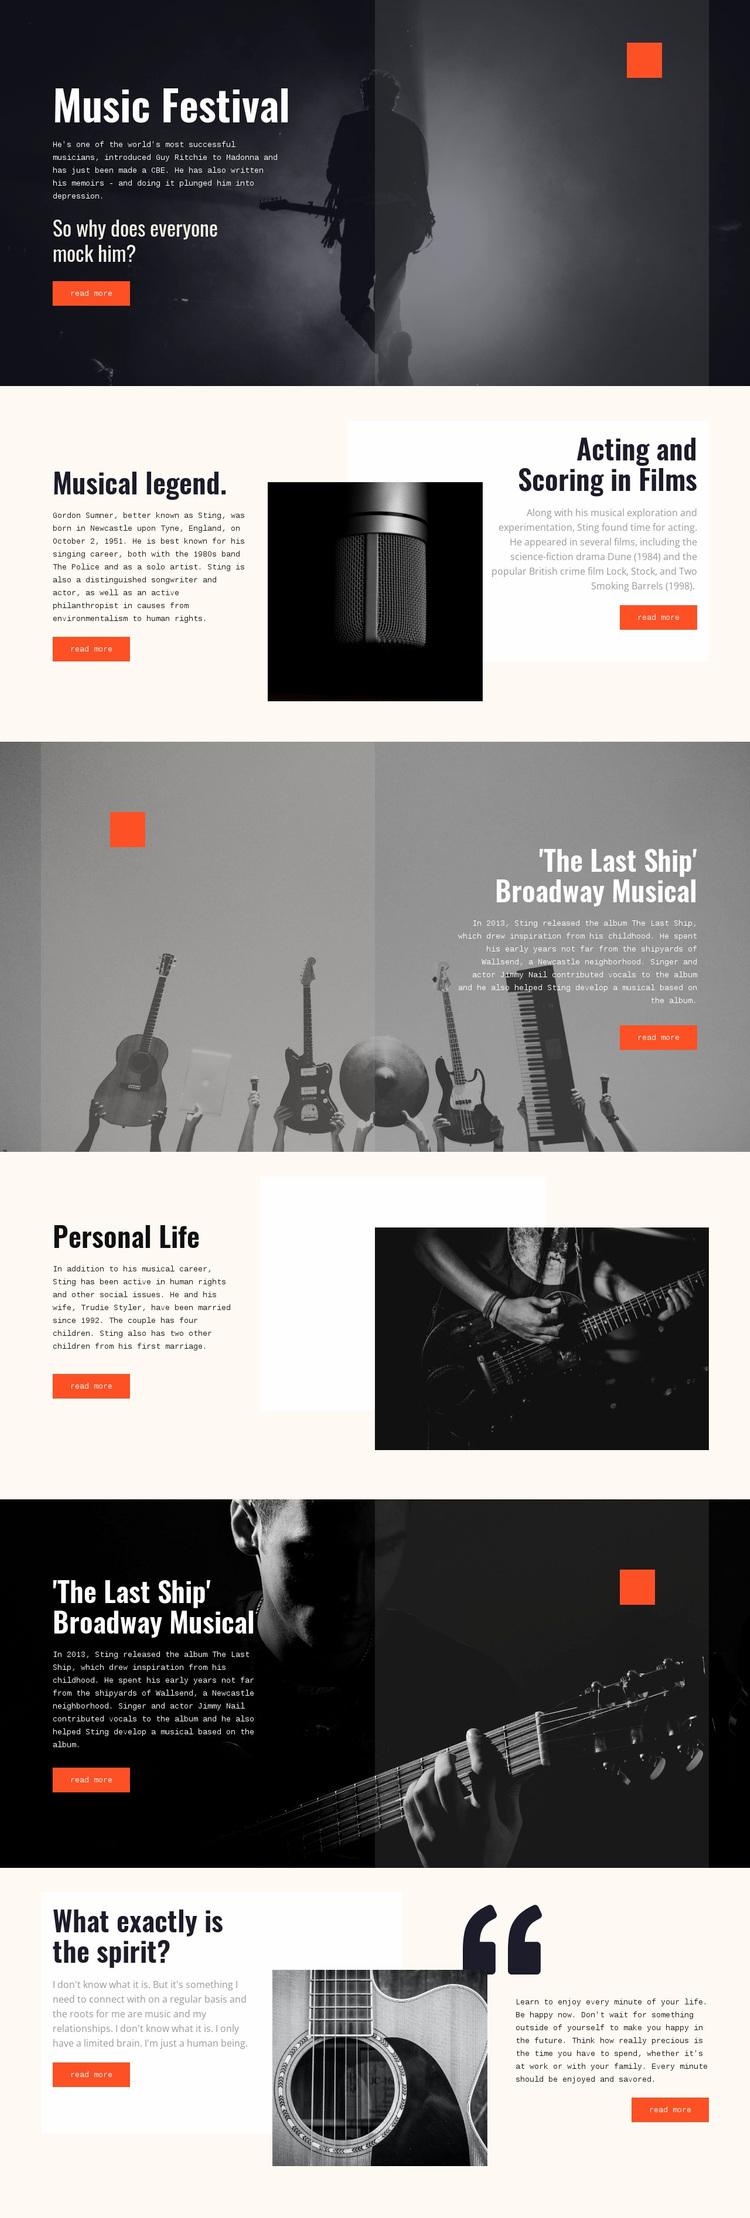 Sting Tale Website Design